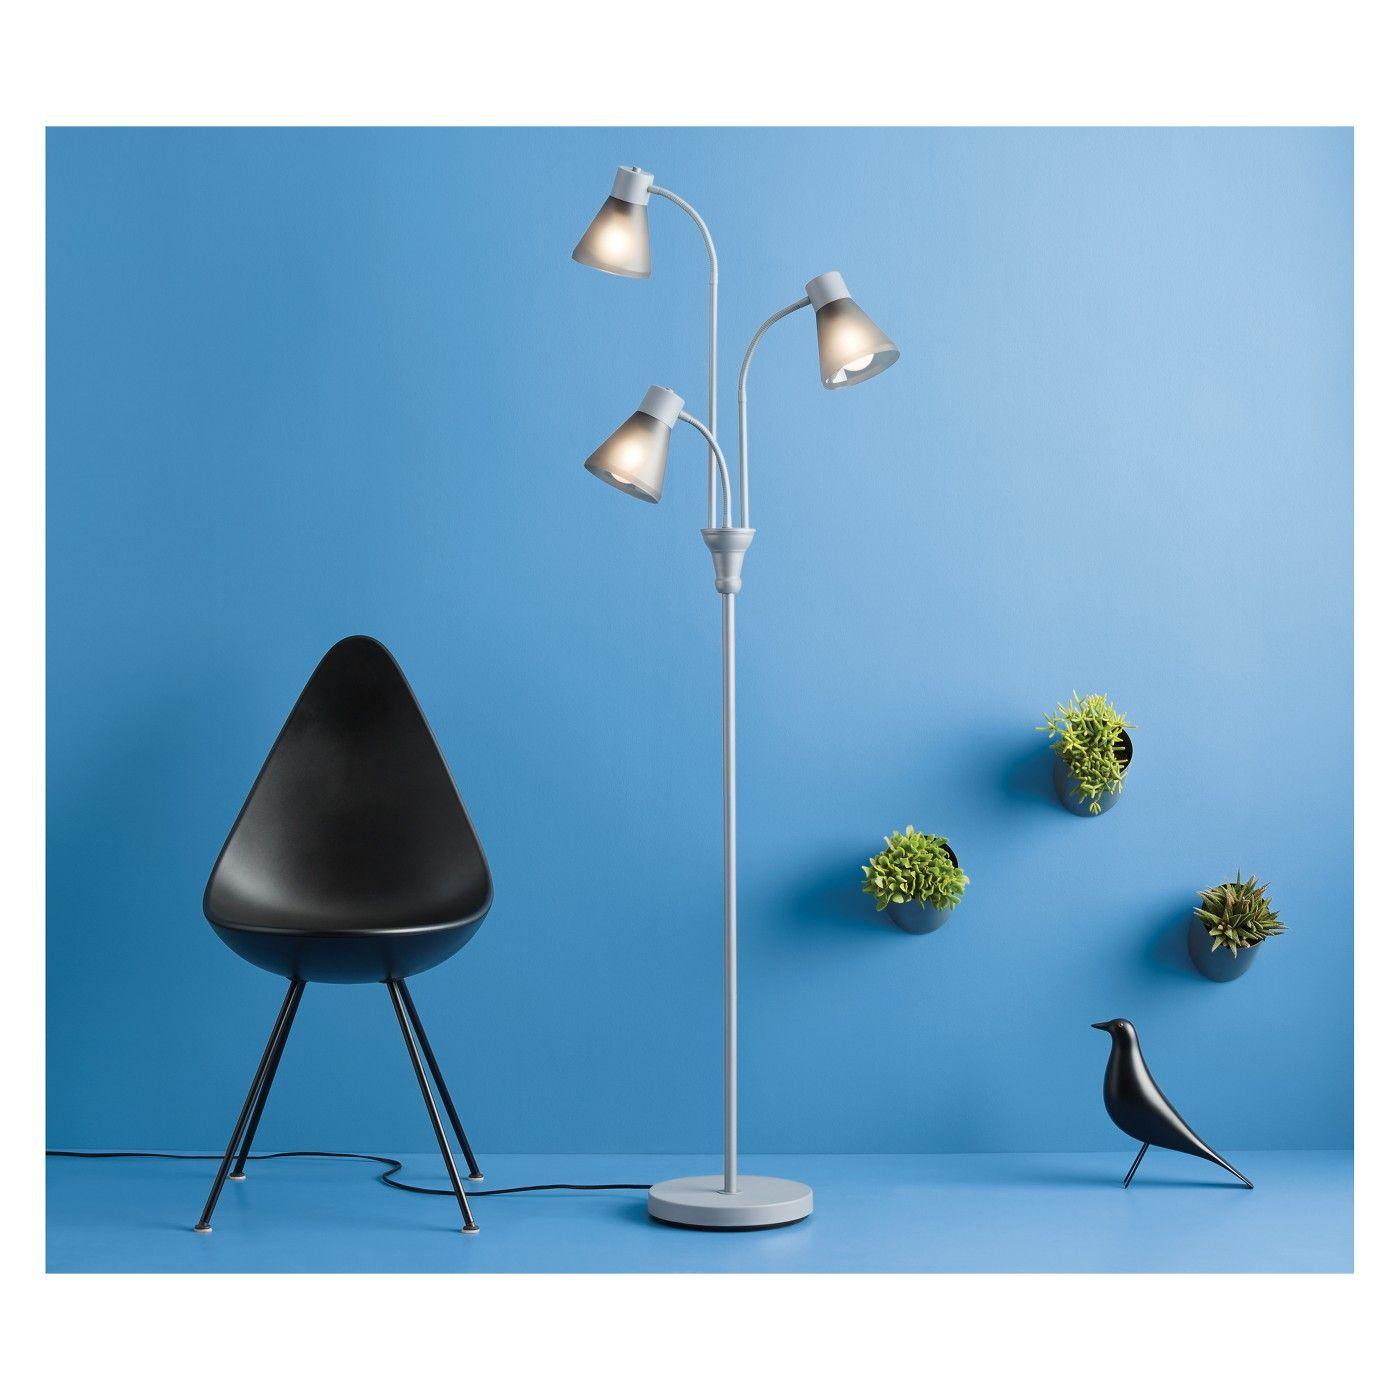 Multi Head Floor Lamp Gray Room Essentials Image 3 Of 3 With